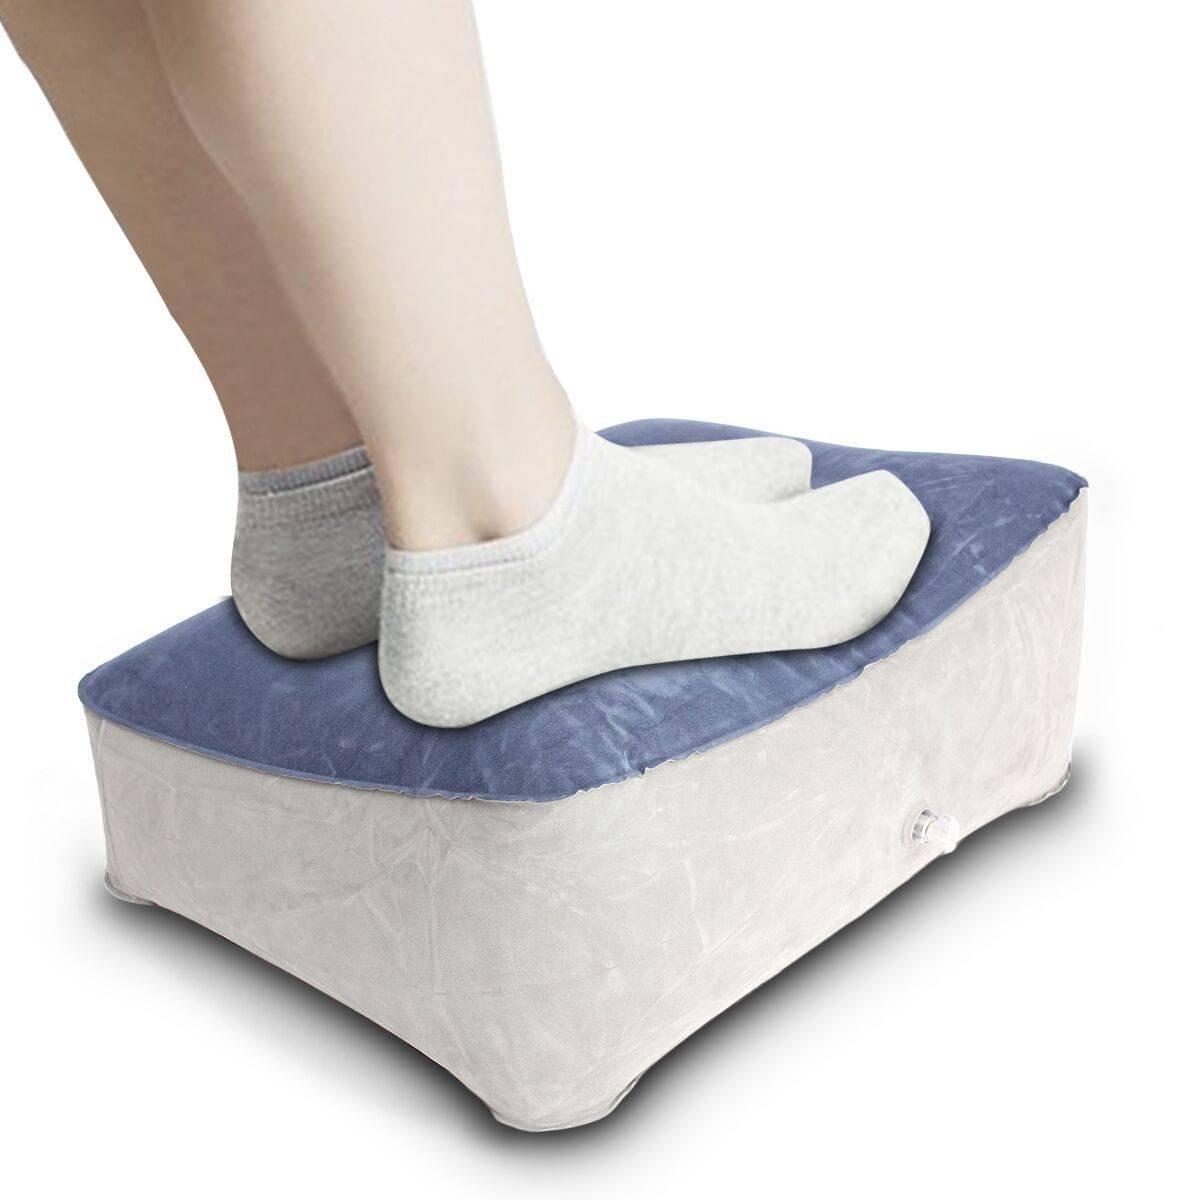 Amazon.com: AUDEW Inflatable Foot Rest Pillow Cushion Travel ...